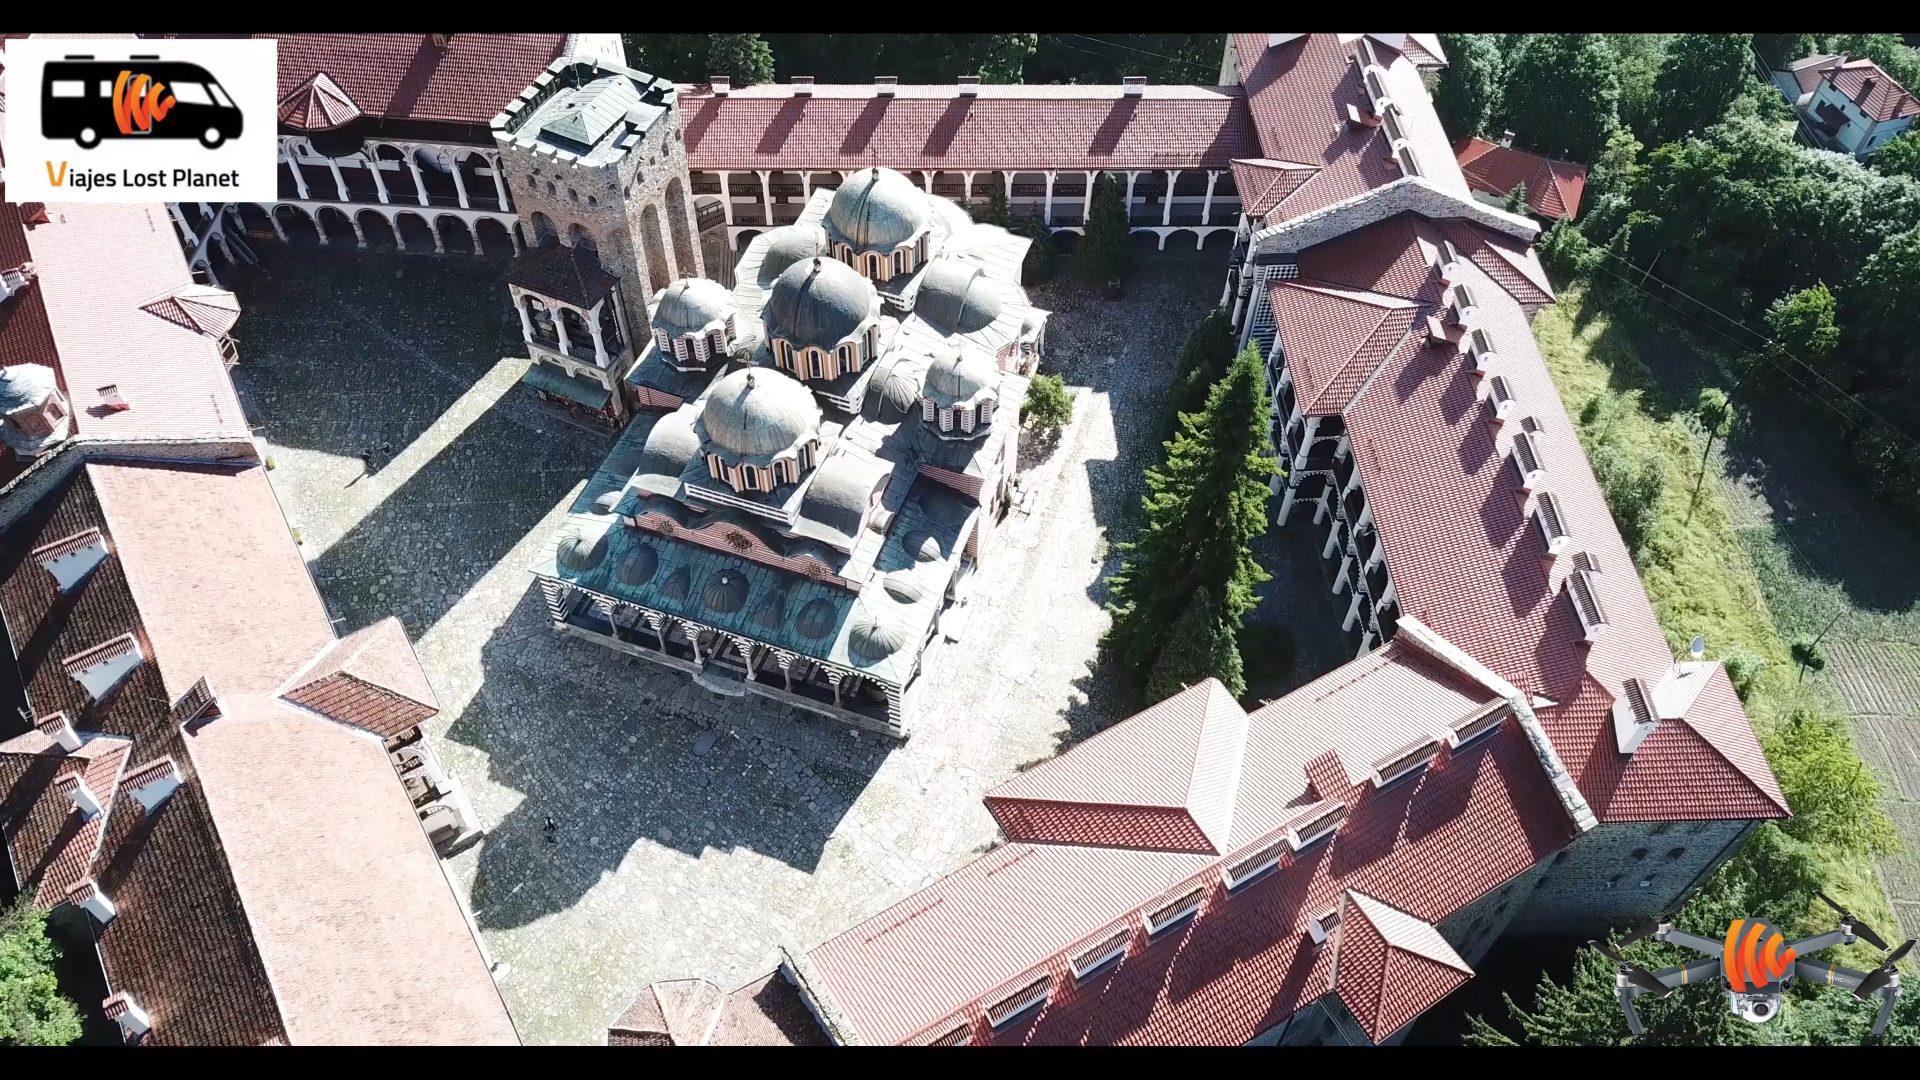 VIDEO: EL MONASTERIO DE RILA (BULGARIA) 4K